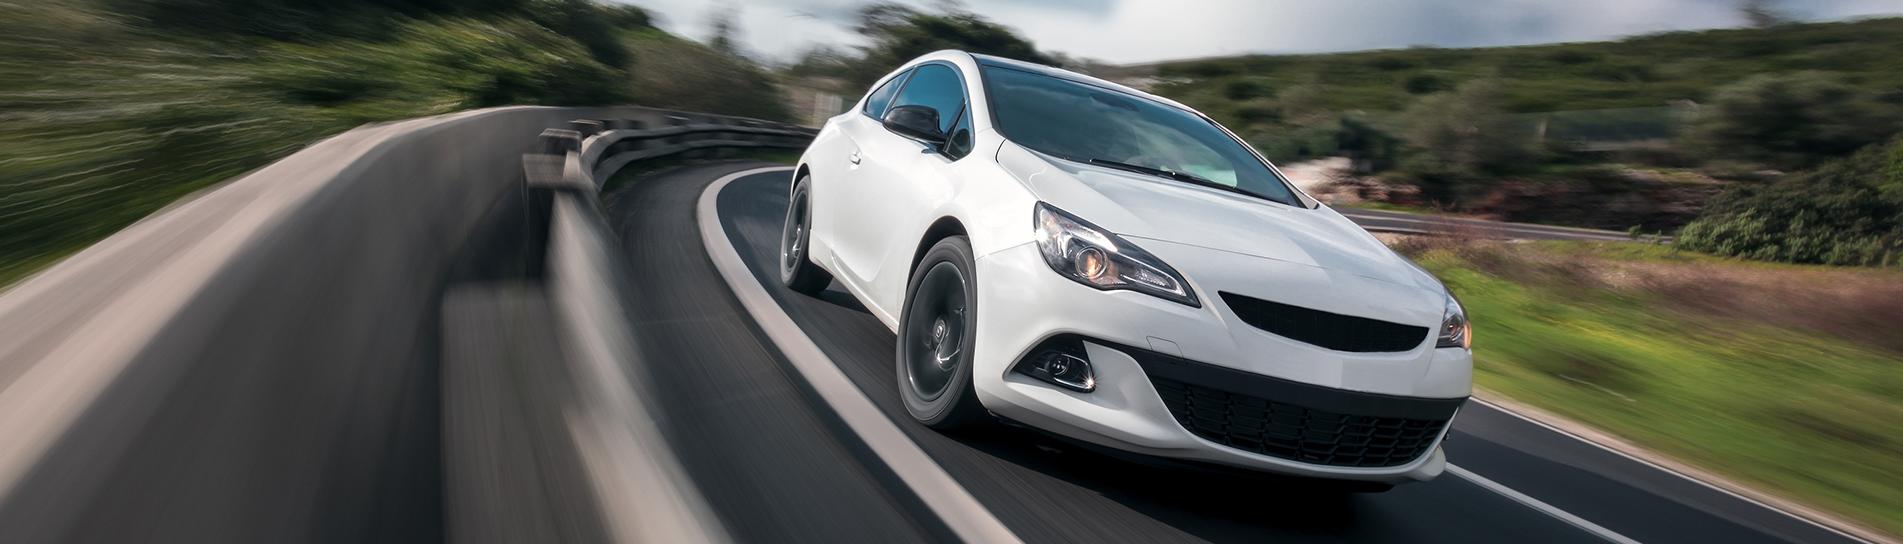 Martin Murphy Car Sales | Prestige Used Cars Tipperary | Car Dealers Nenagh